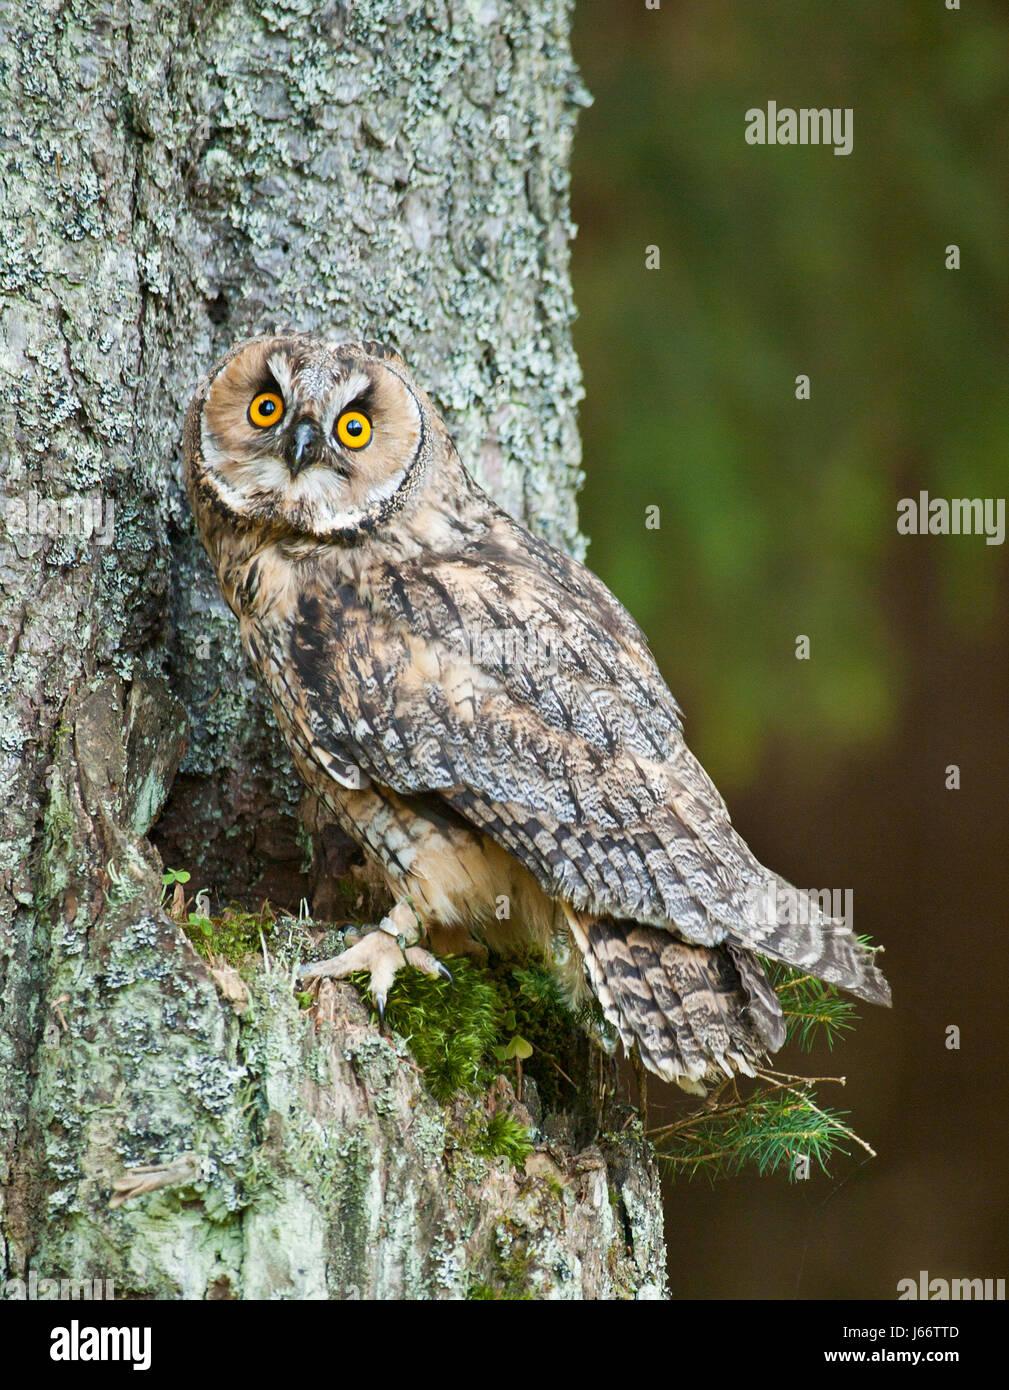 Long-eared owl siting on the tree - Asio otus otus - Stock Image